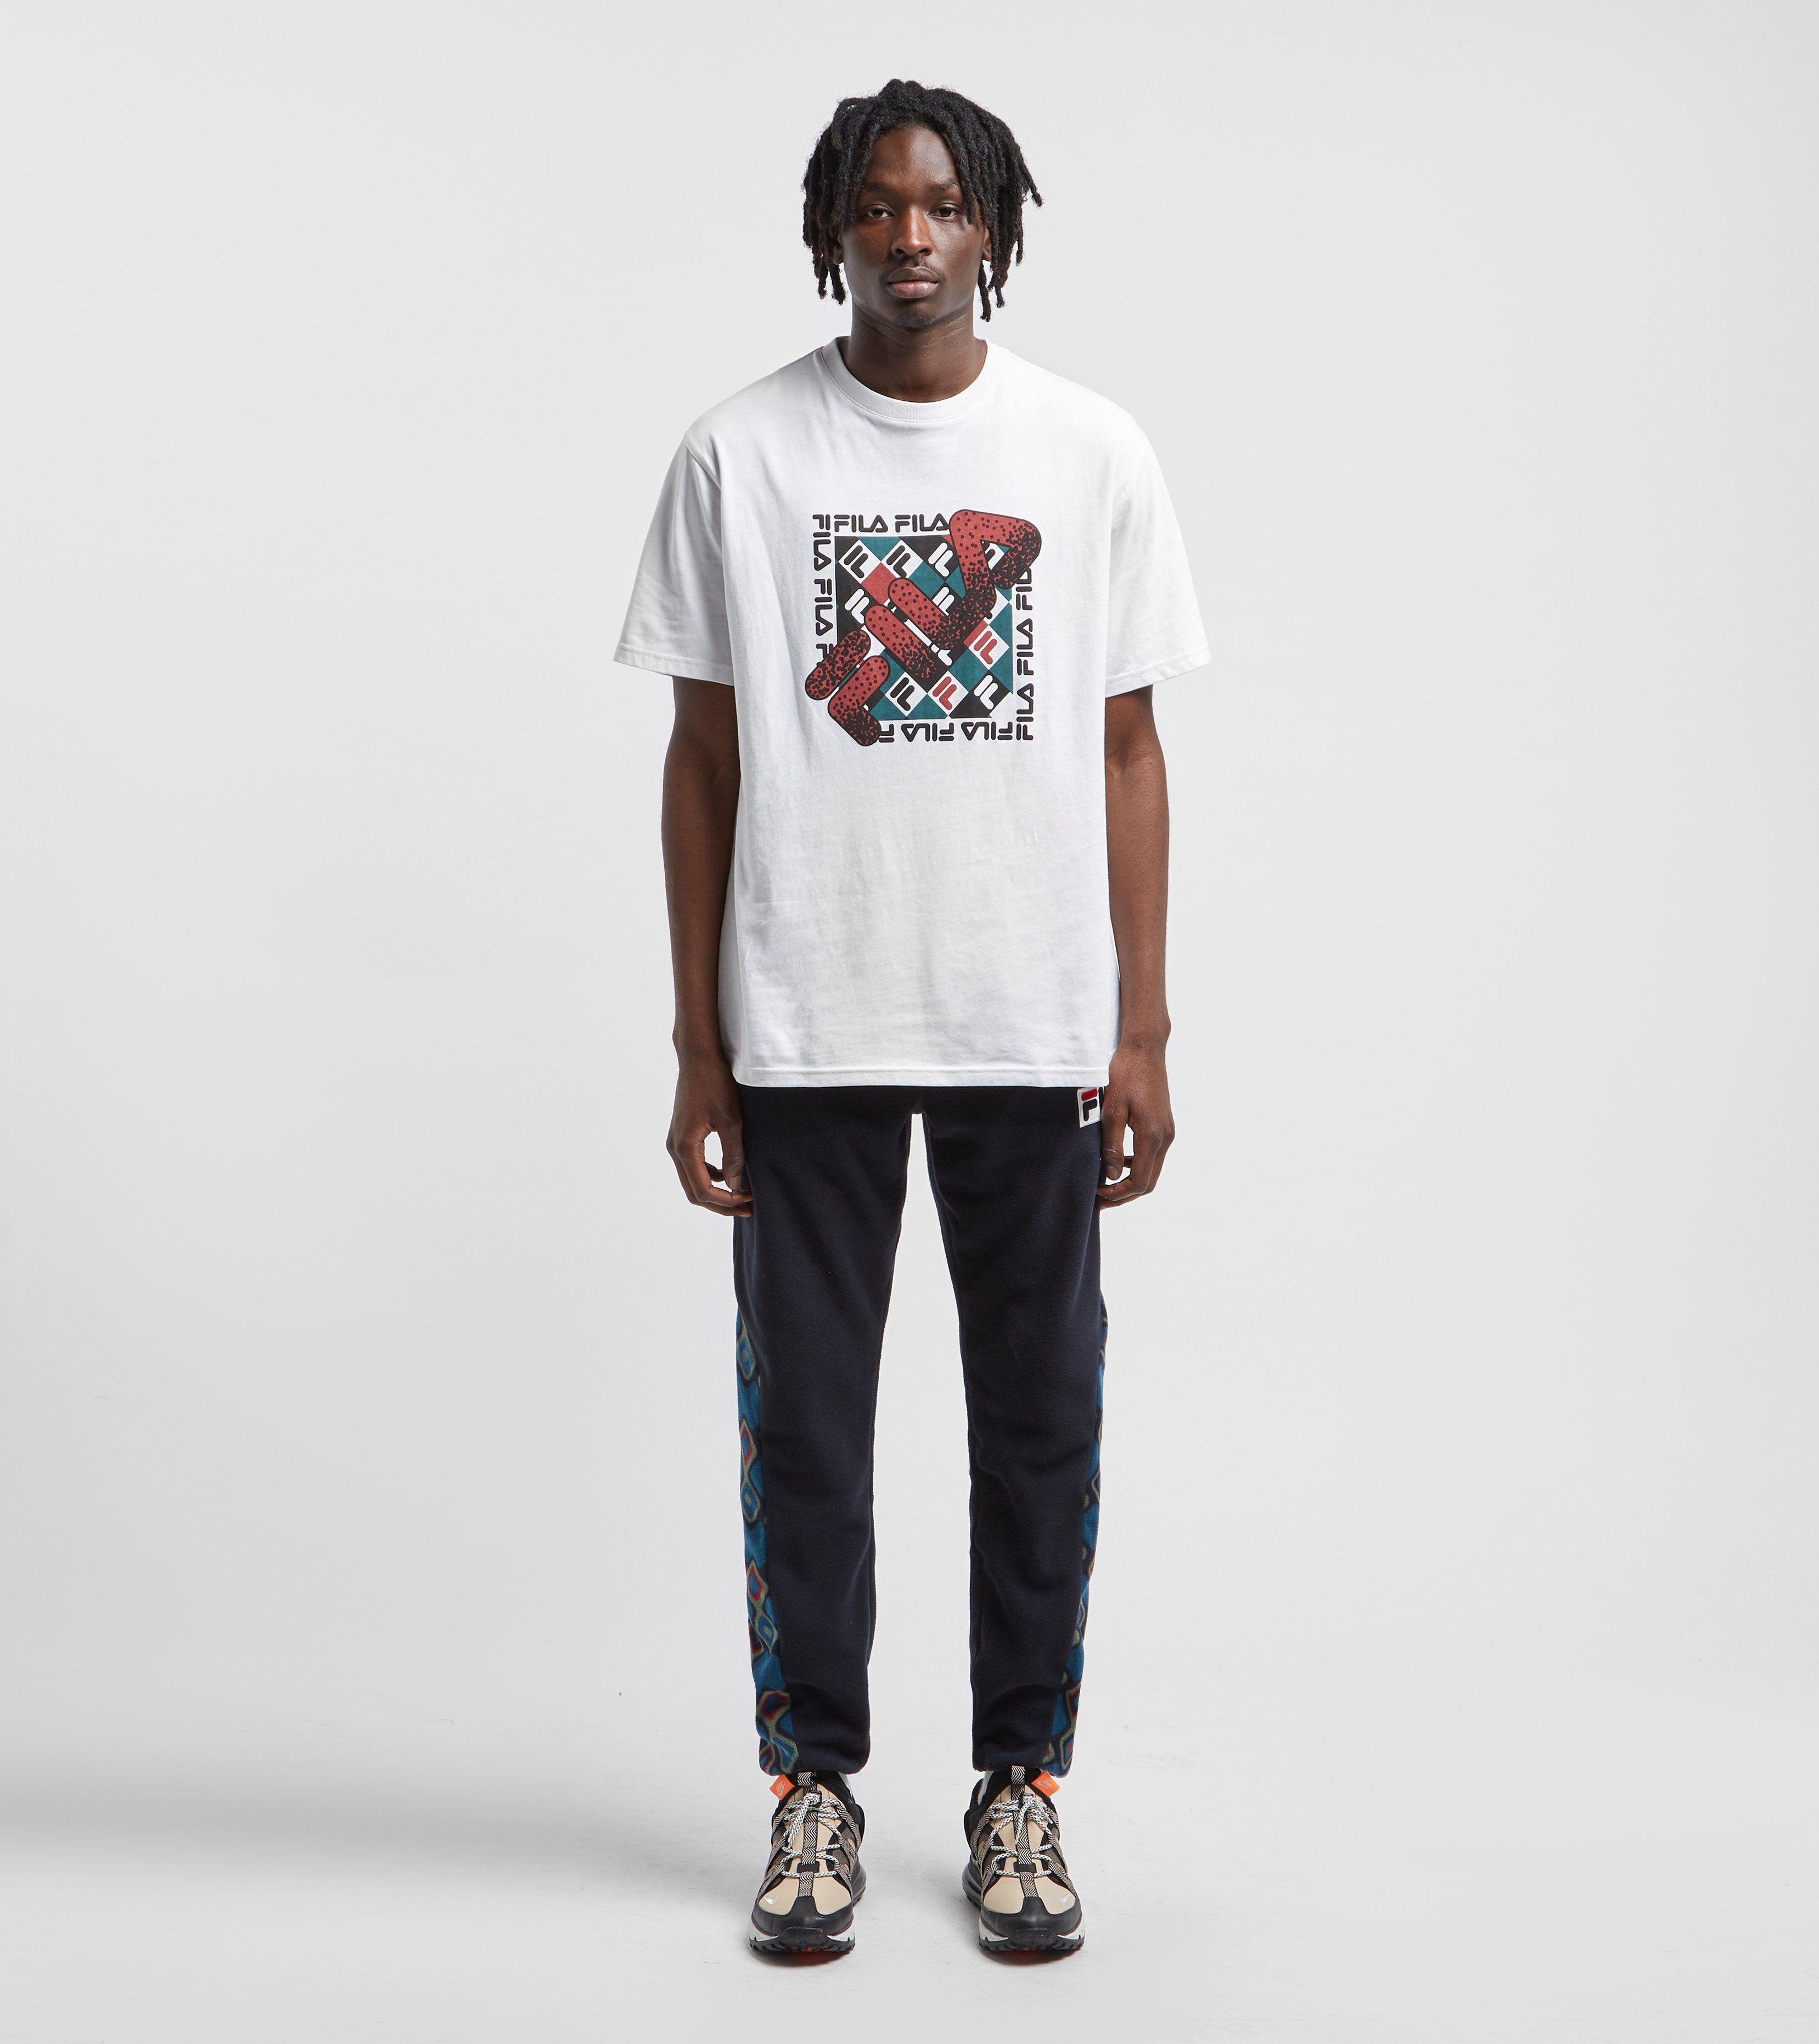 Fila Vintage Check T-Shirt - size? Exclusive